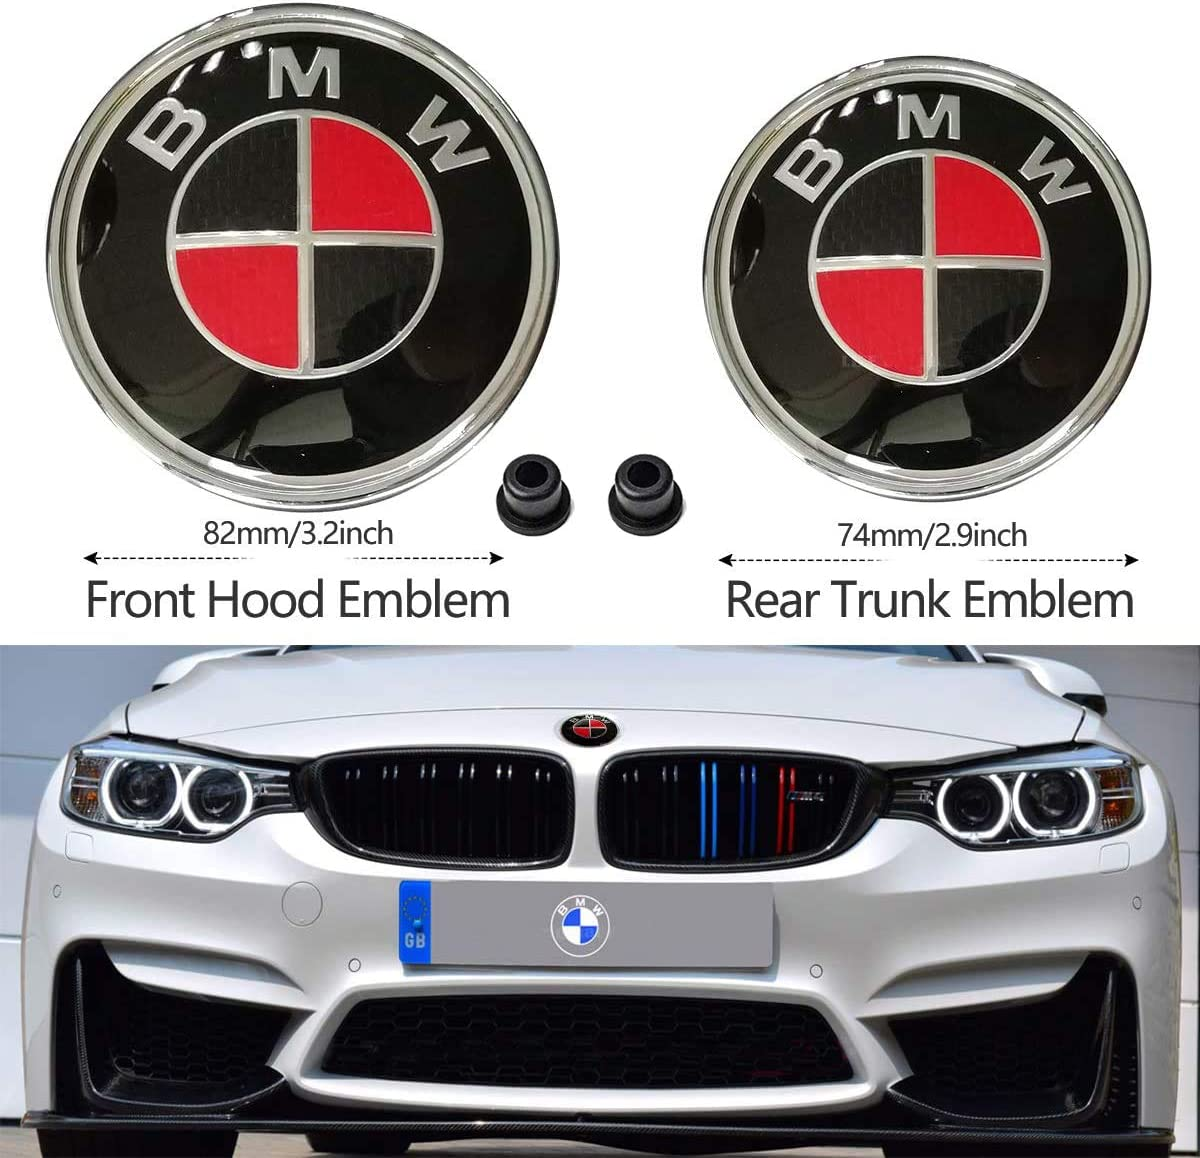 Red Black 2PCS B-M-W Black and Red 82mm Hood Emblem/74mm Trunk ...